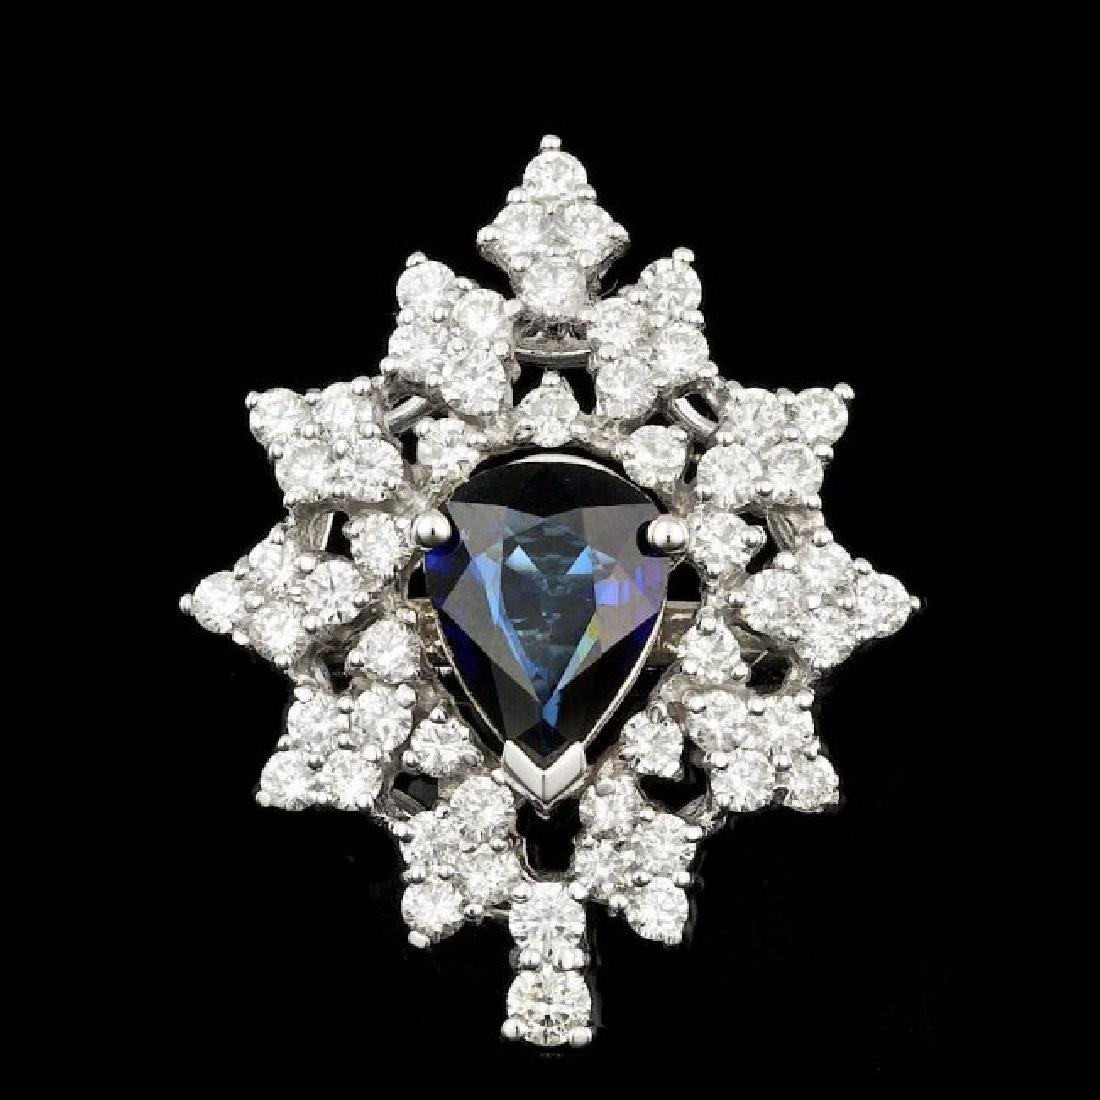 14k Gold 2.00ct Sapphire 1.55ct Diamond Ring